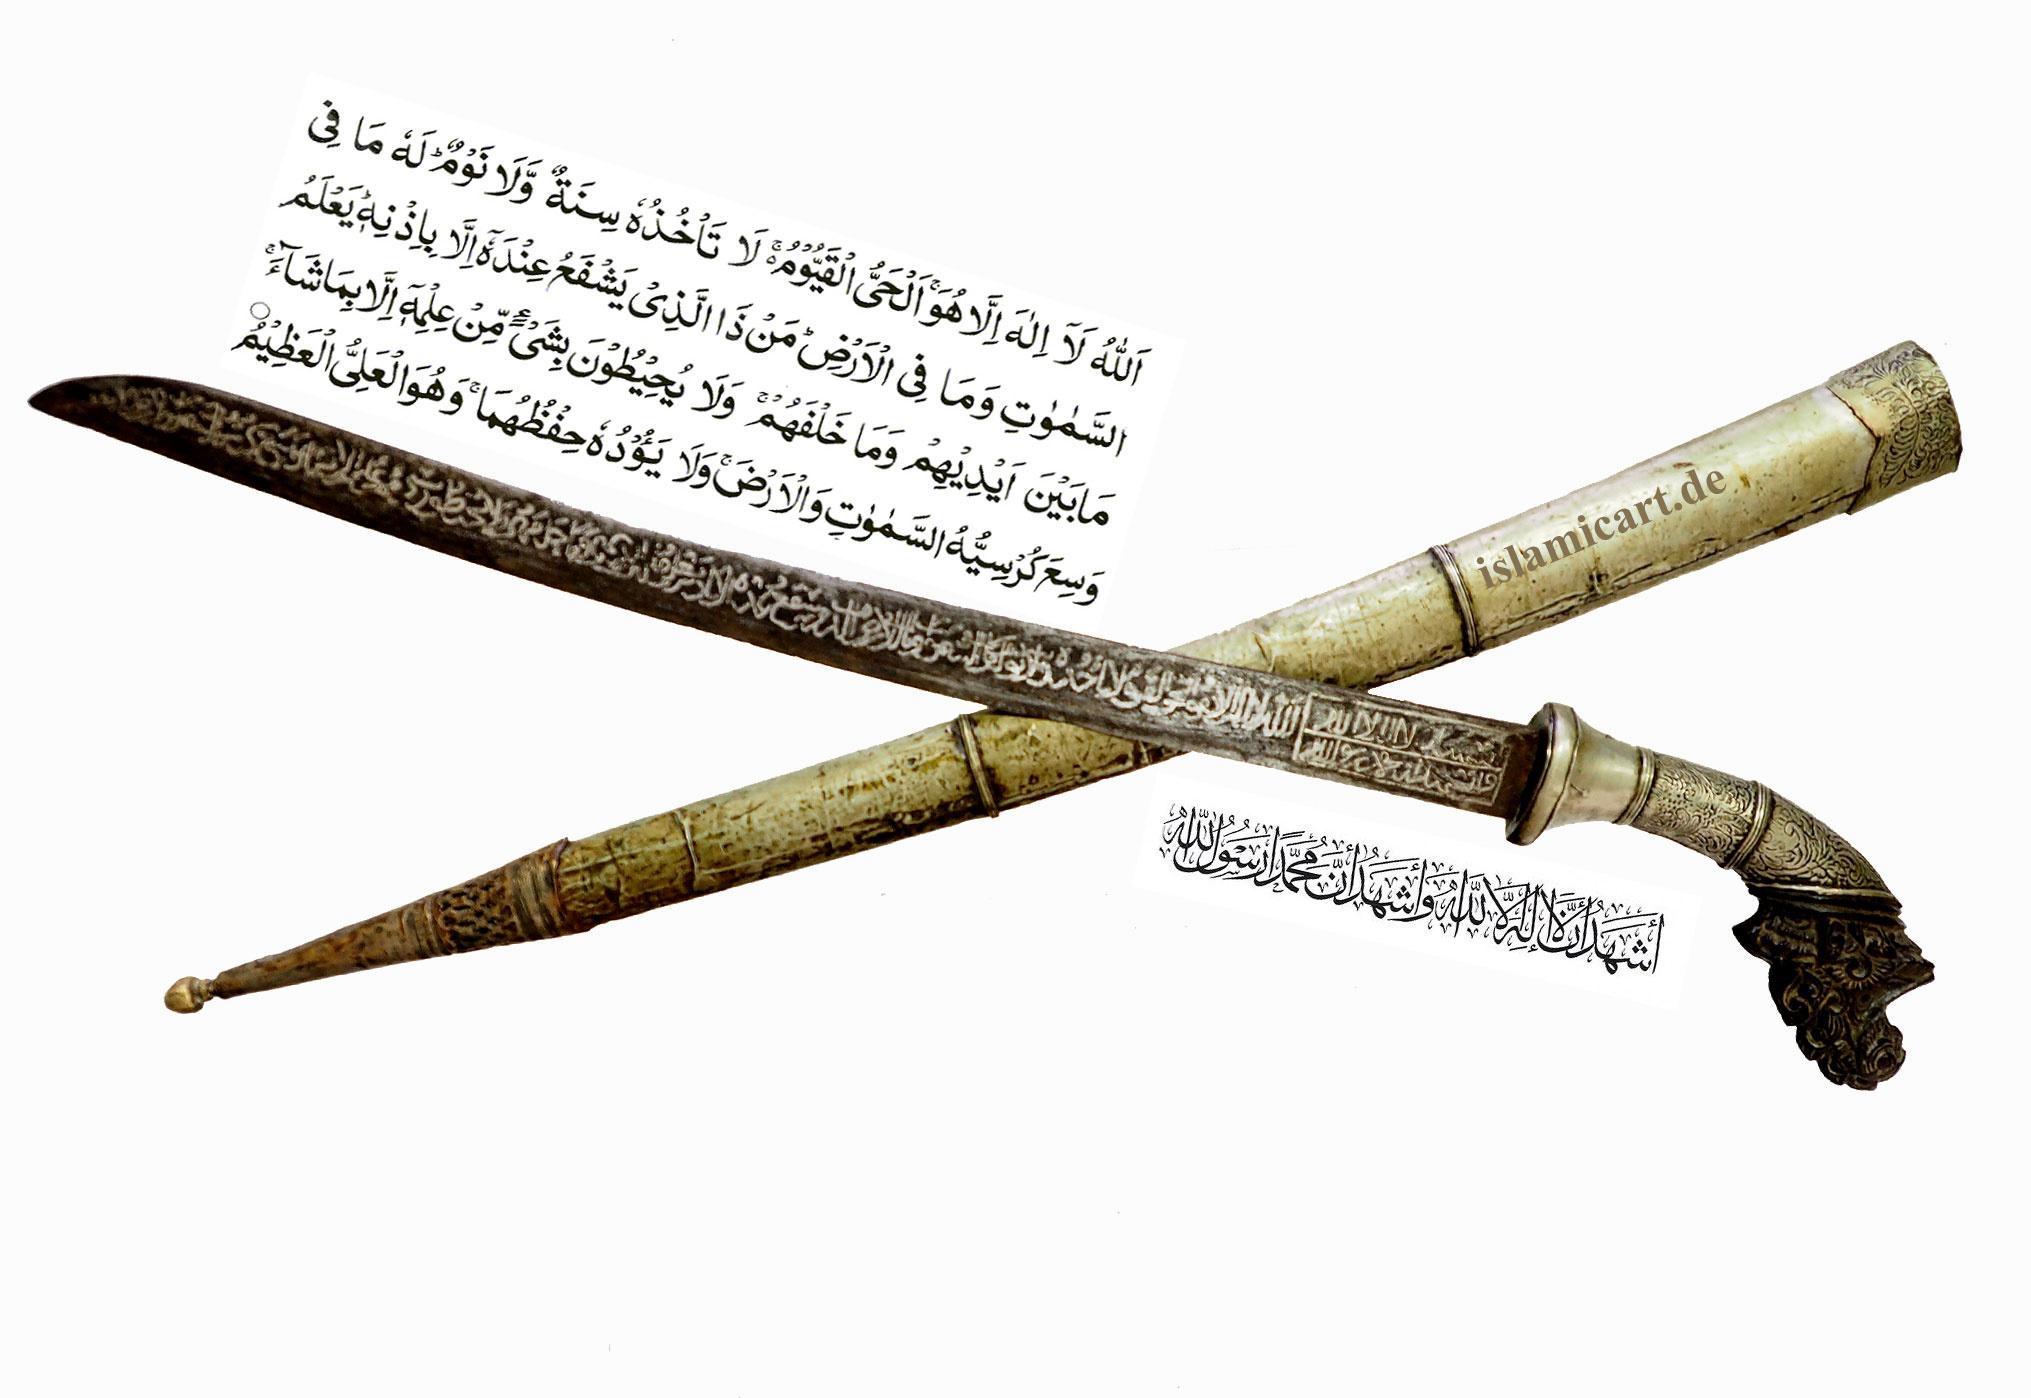 Antique islamic Filipino Visayan Philippines Tenegre Sword Dagger Knife 18/19th Century